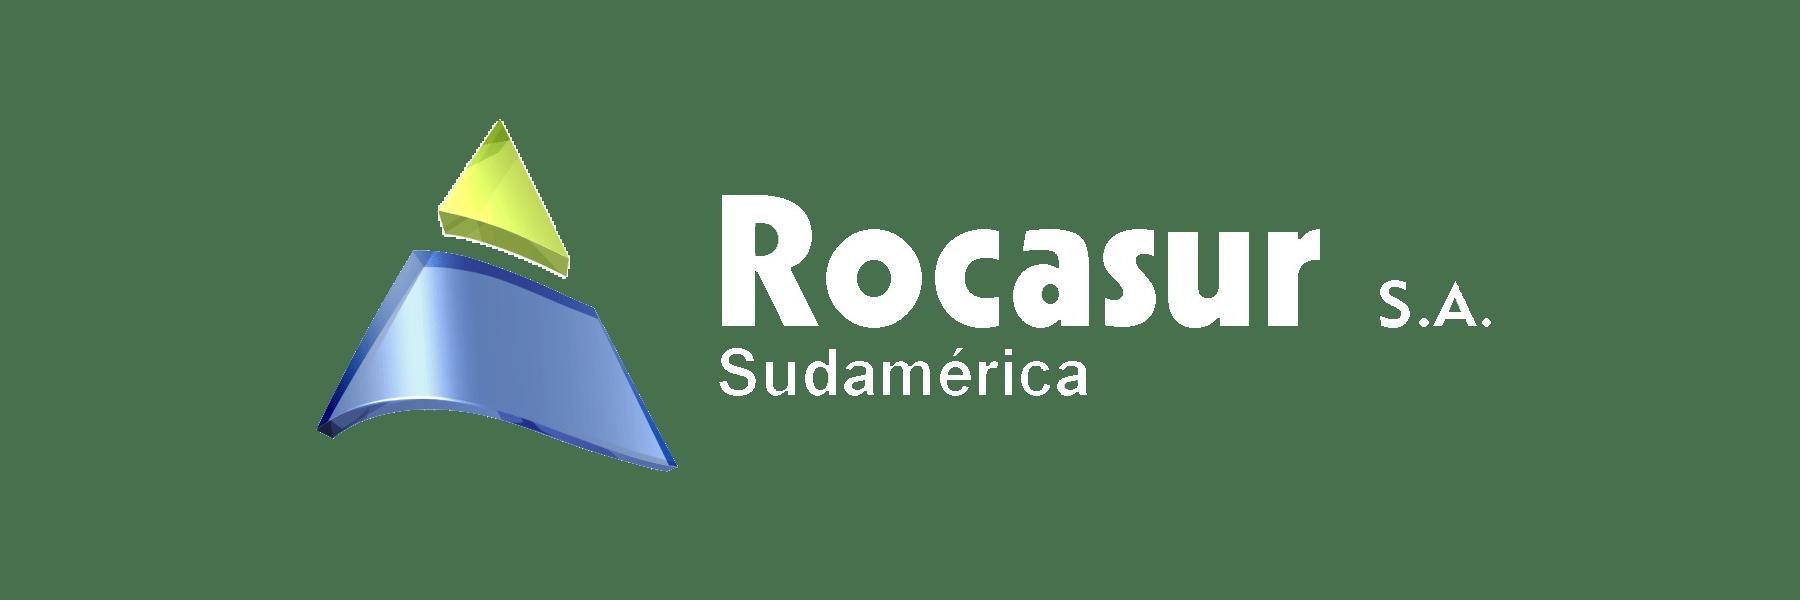 Rocasur Sudamericana